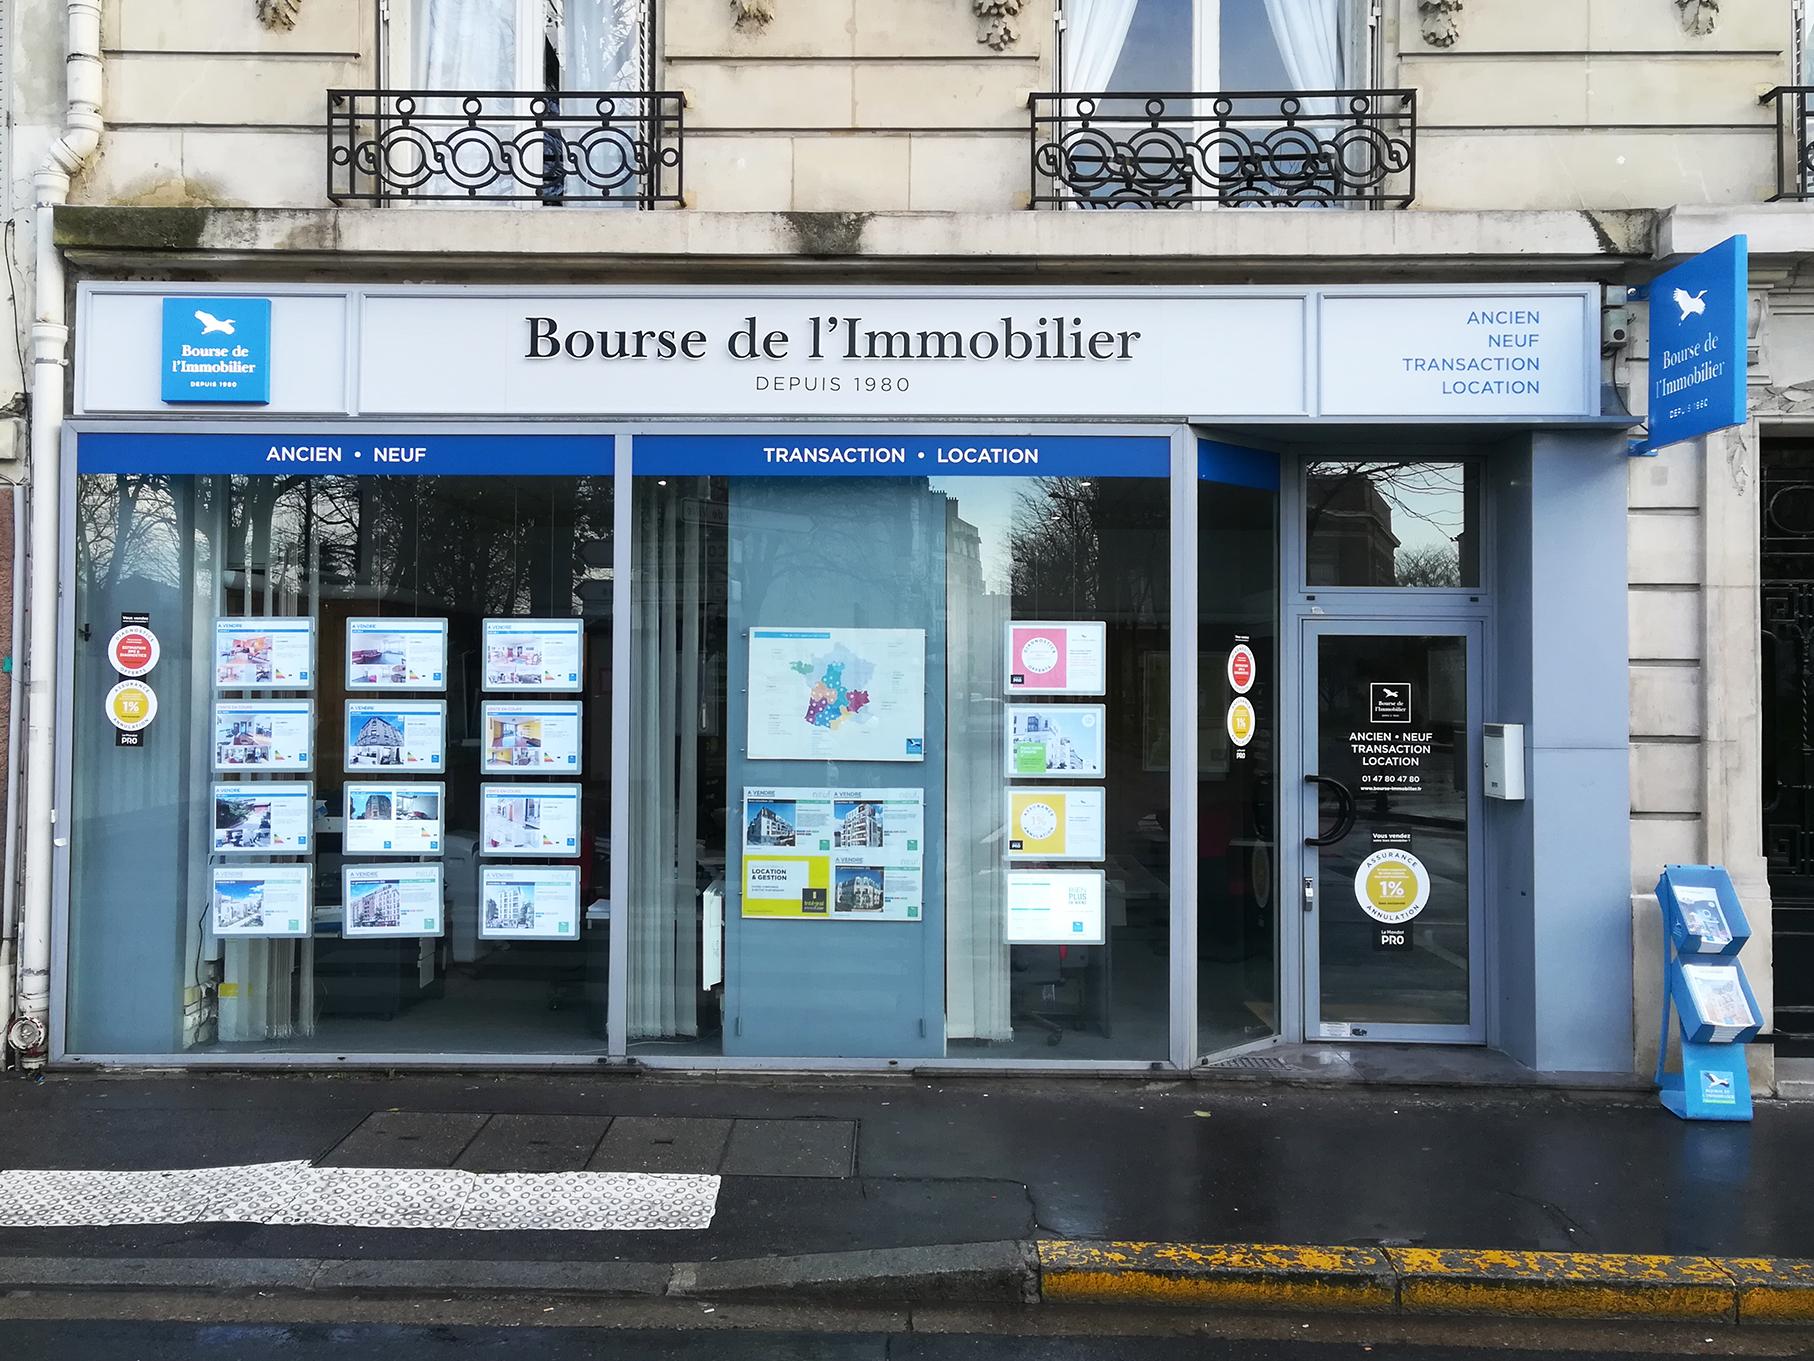 Agence Immobiliere Bois Colombes - Agences immobili u00e8res Bourse de l'Immobilier